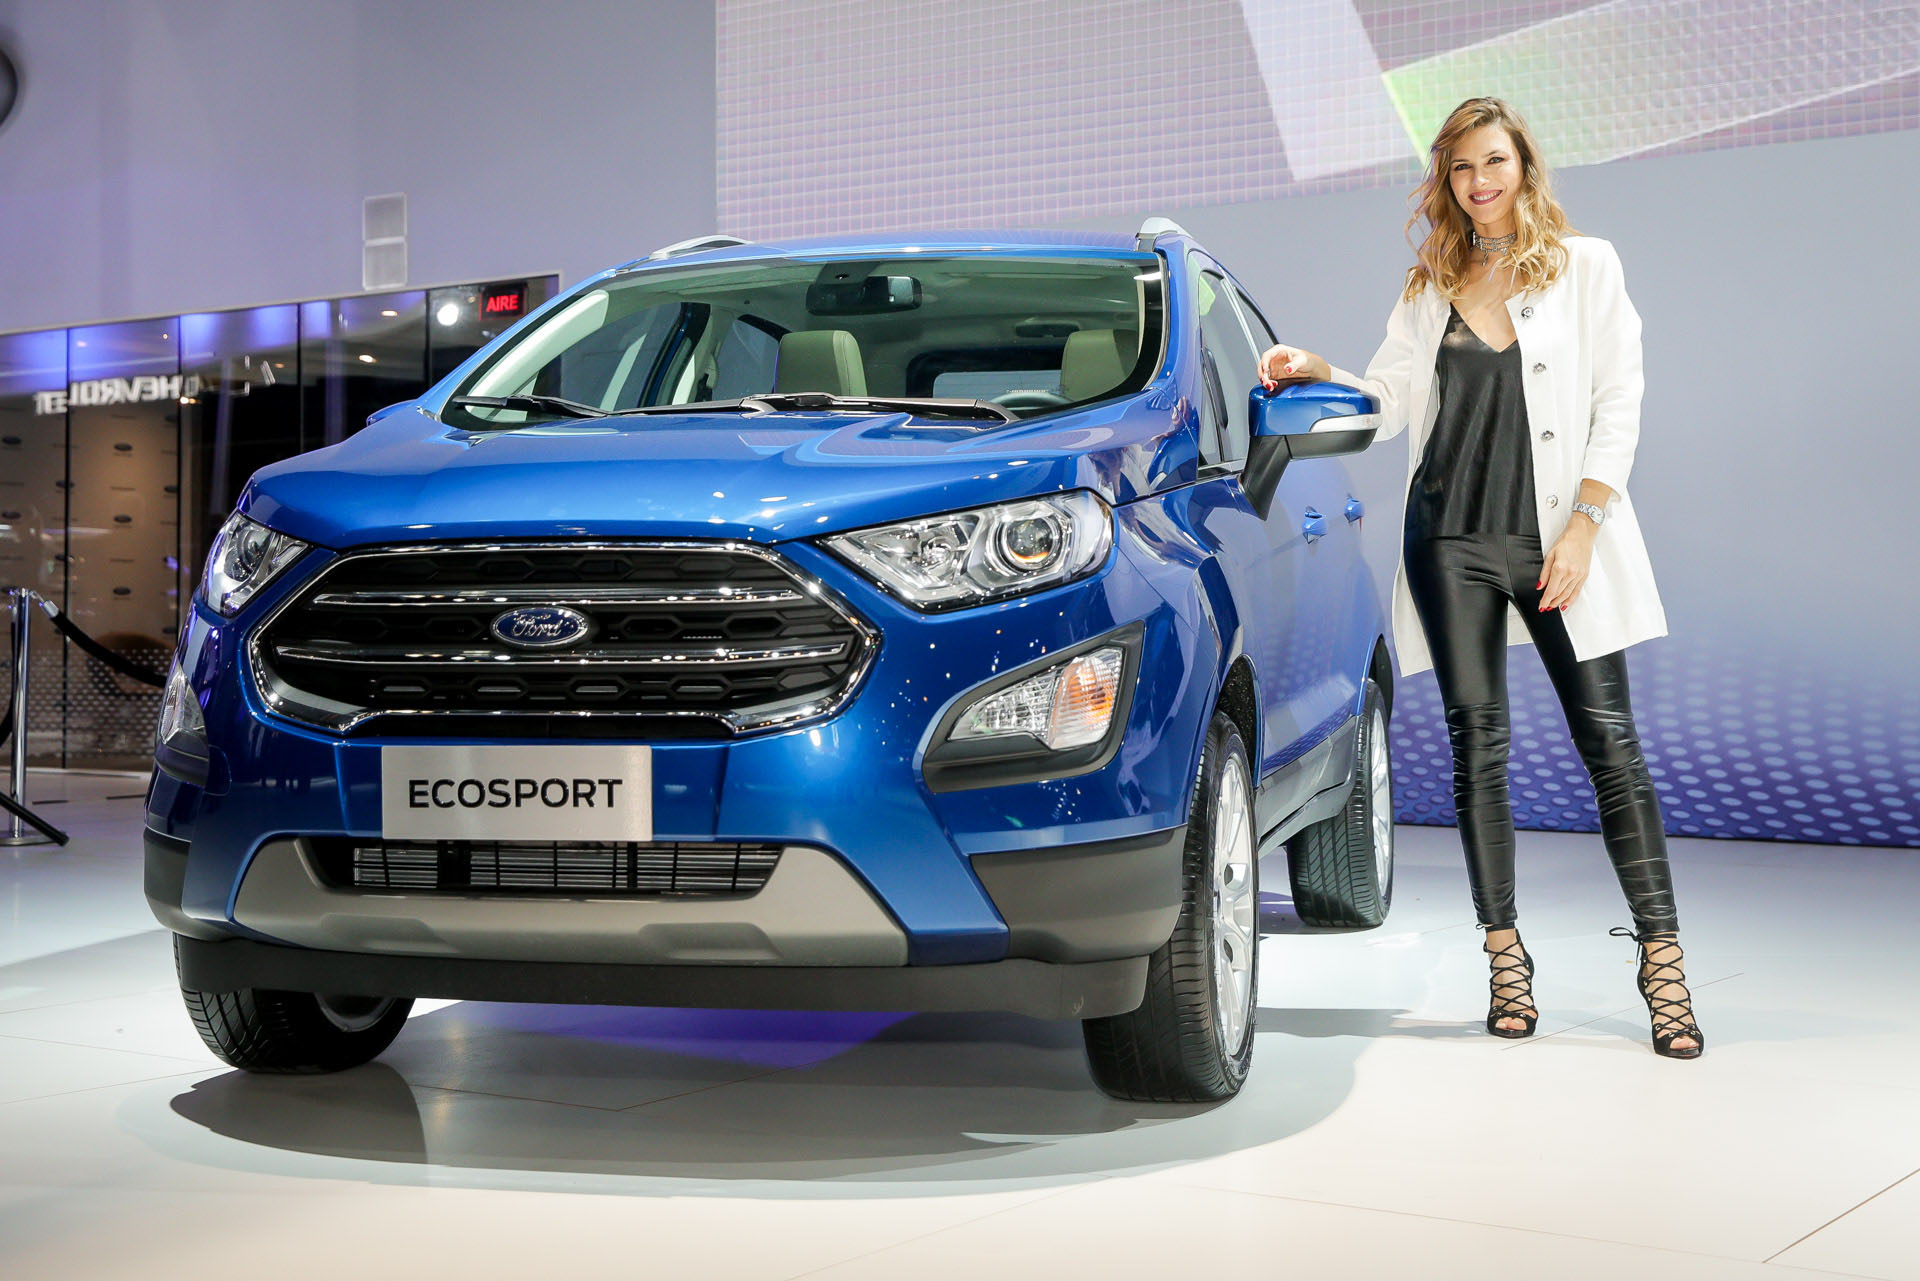 La modelo Pia Slapka también posó junto a la Nueva Ecosport